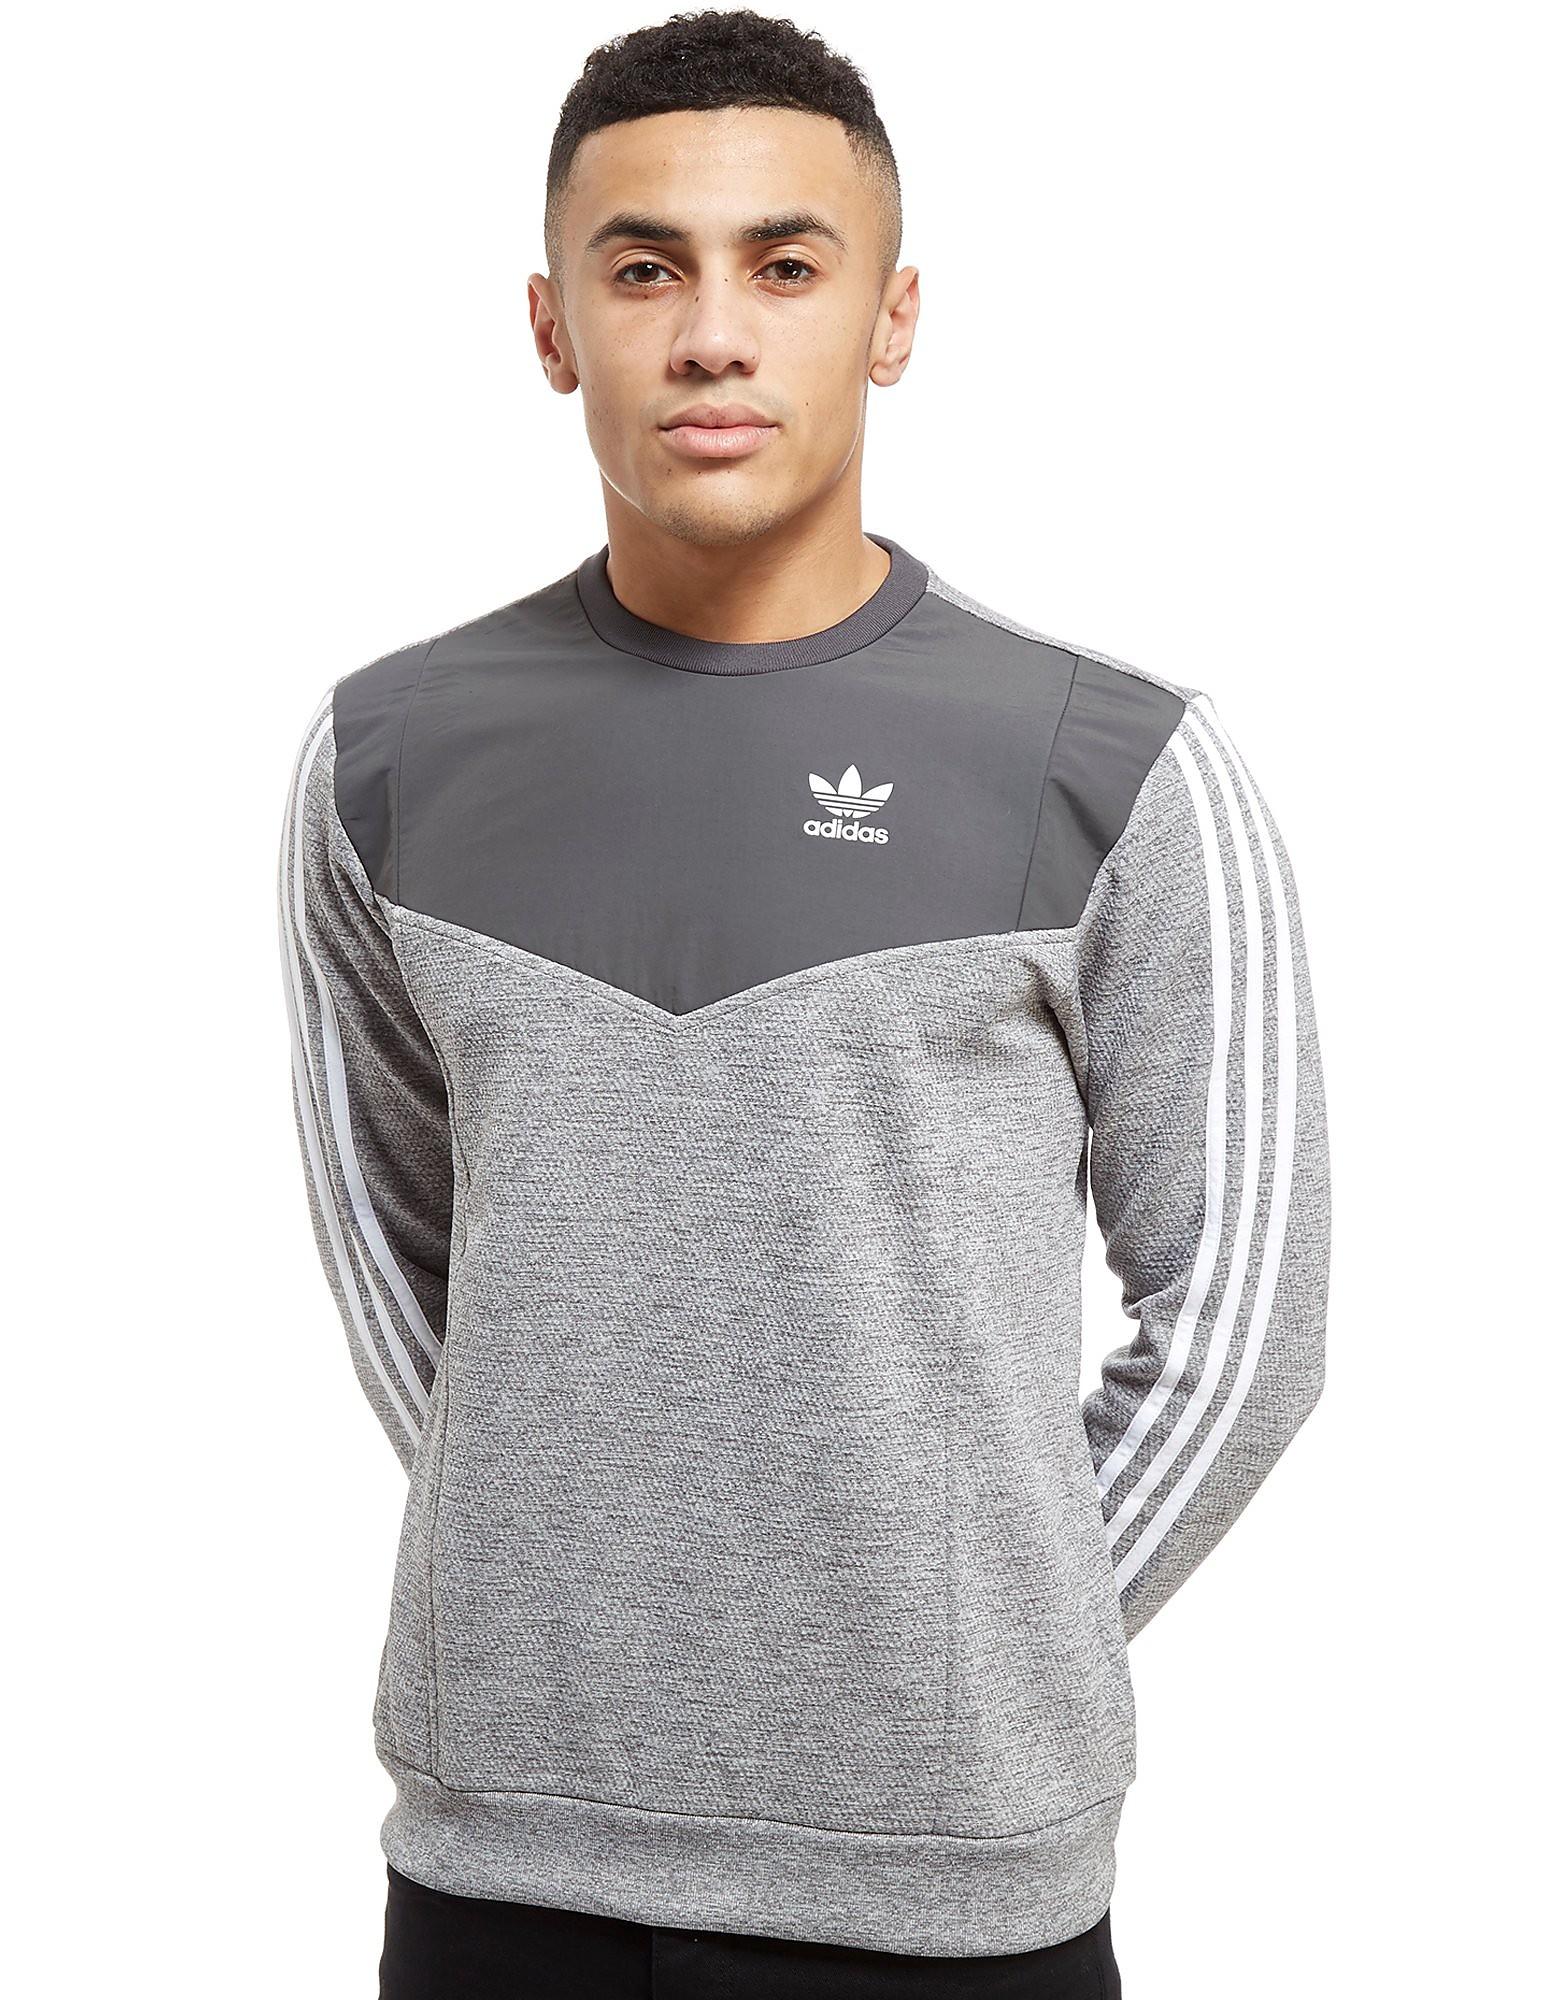 adidas Originals Nova Woven Crew Sweatshirt - Only at JD - gris, gris